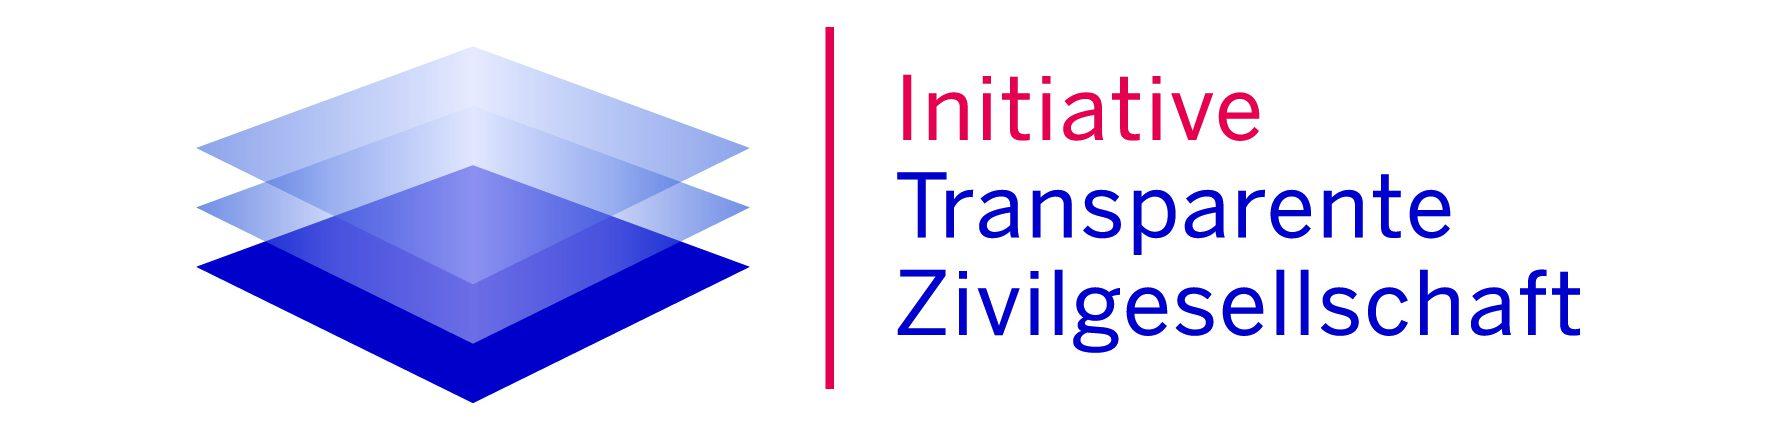 Logo Transparente Zivilgesellschaft e1553682685751 - Stop Dengue